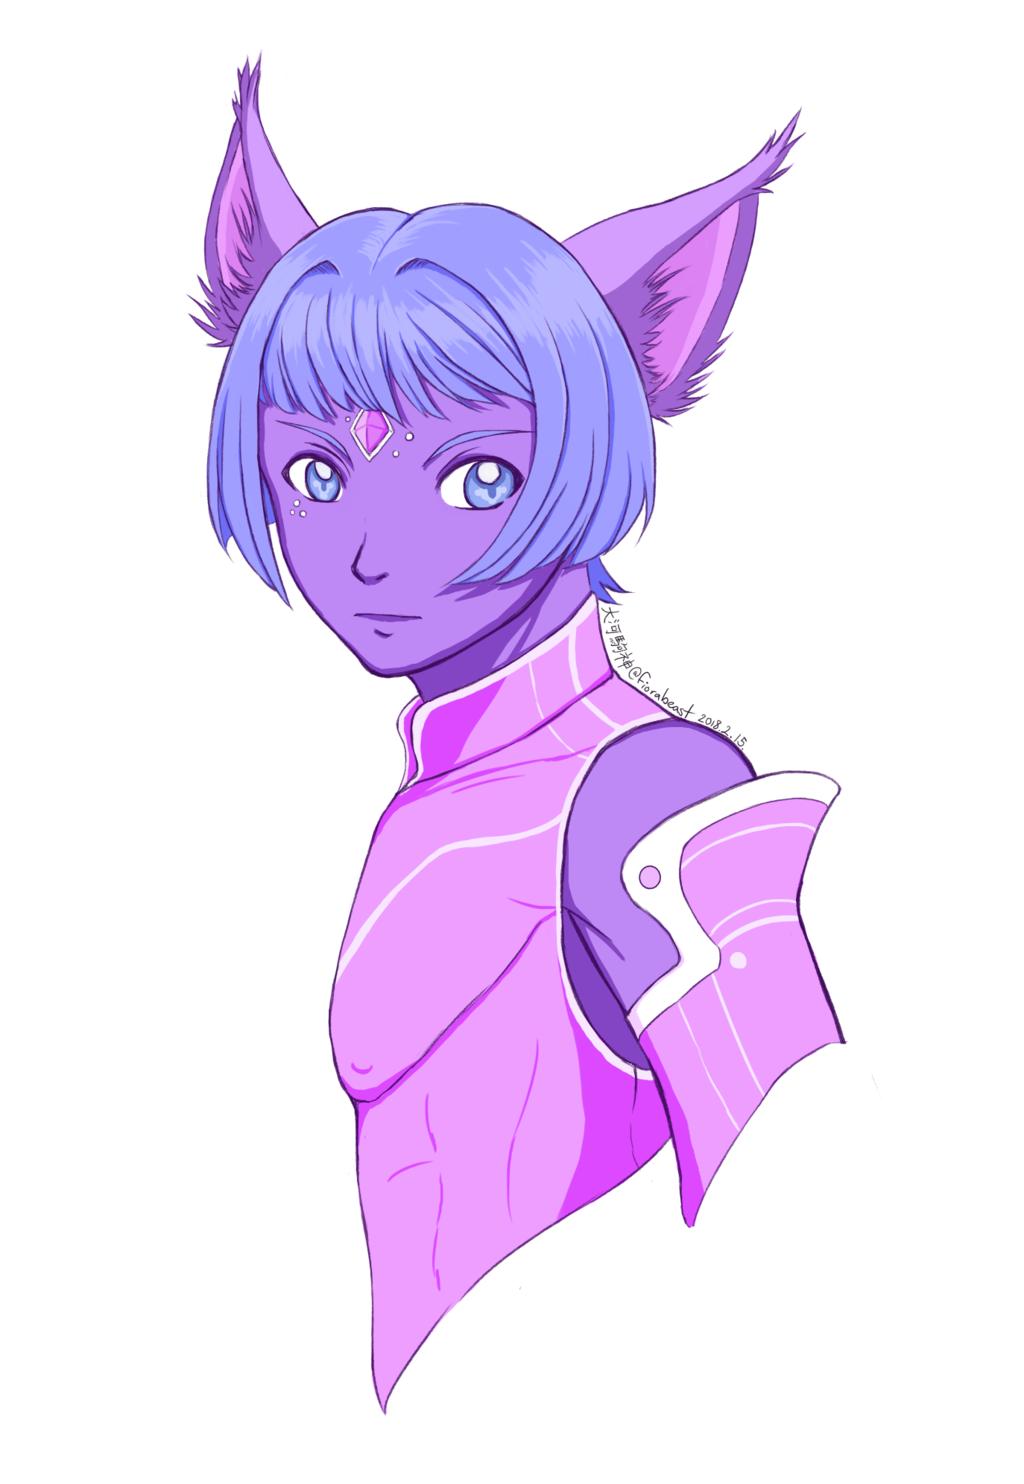 Most recent image: Star jewel cat